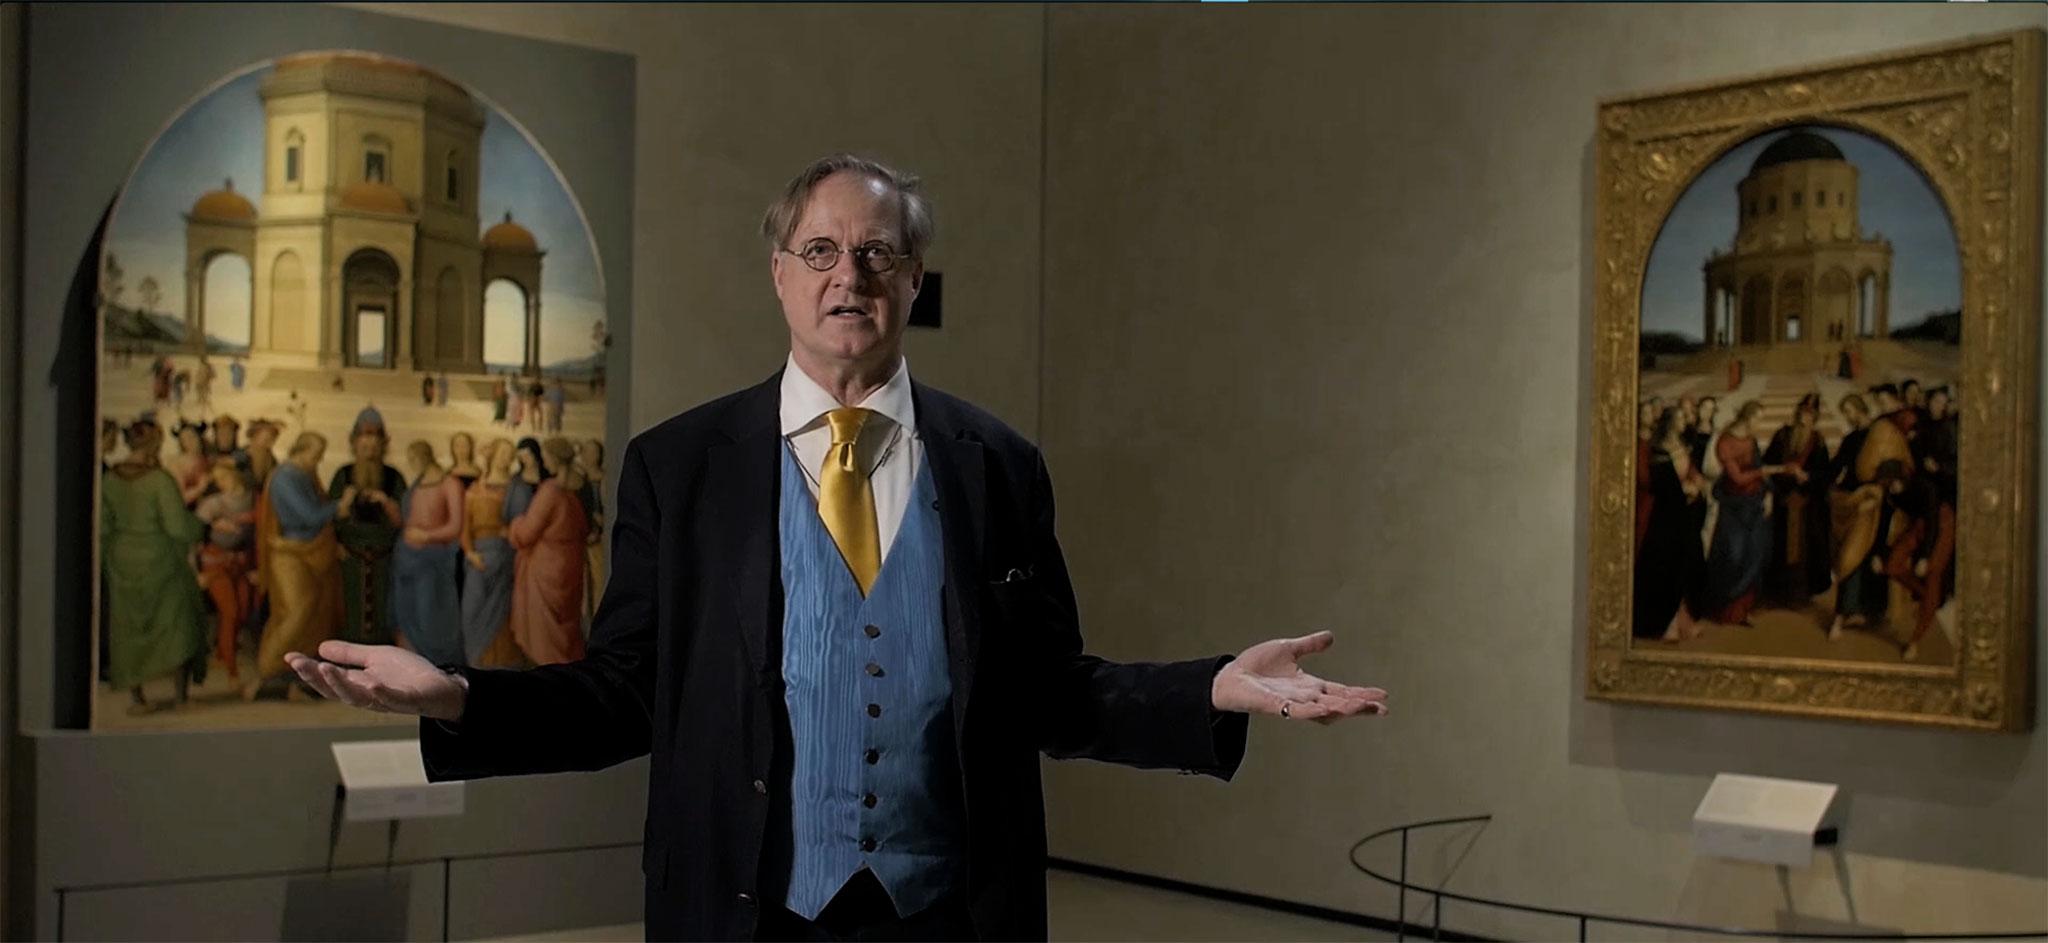 James M. Bradburne <br>presenta <br>Raffaello e Perugino